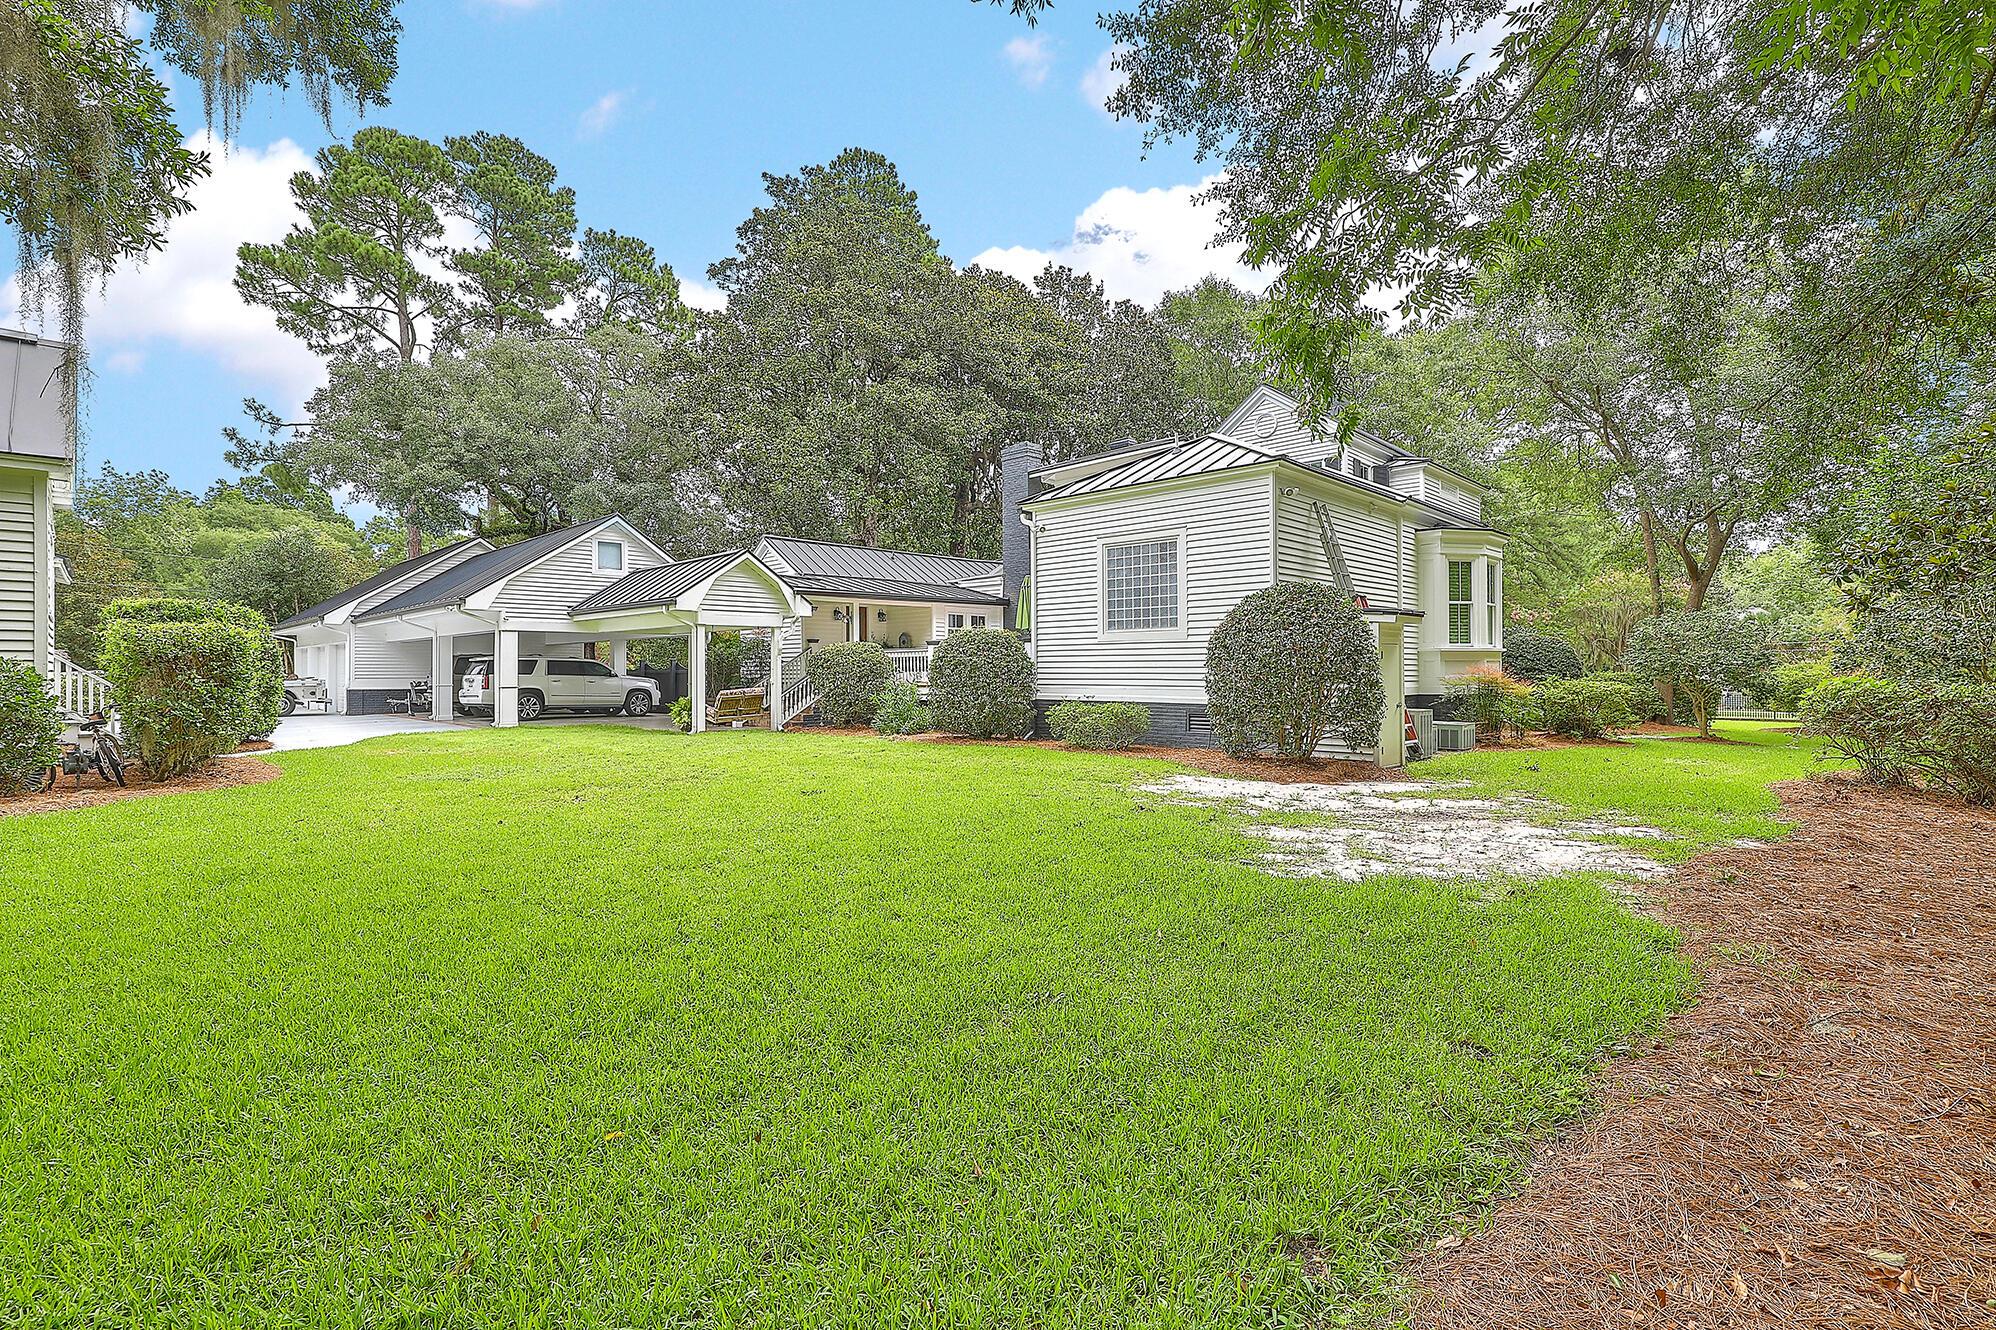 Summerville Homes For Sale - 102 Hickory, Summerville, SC - 19